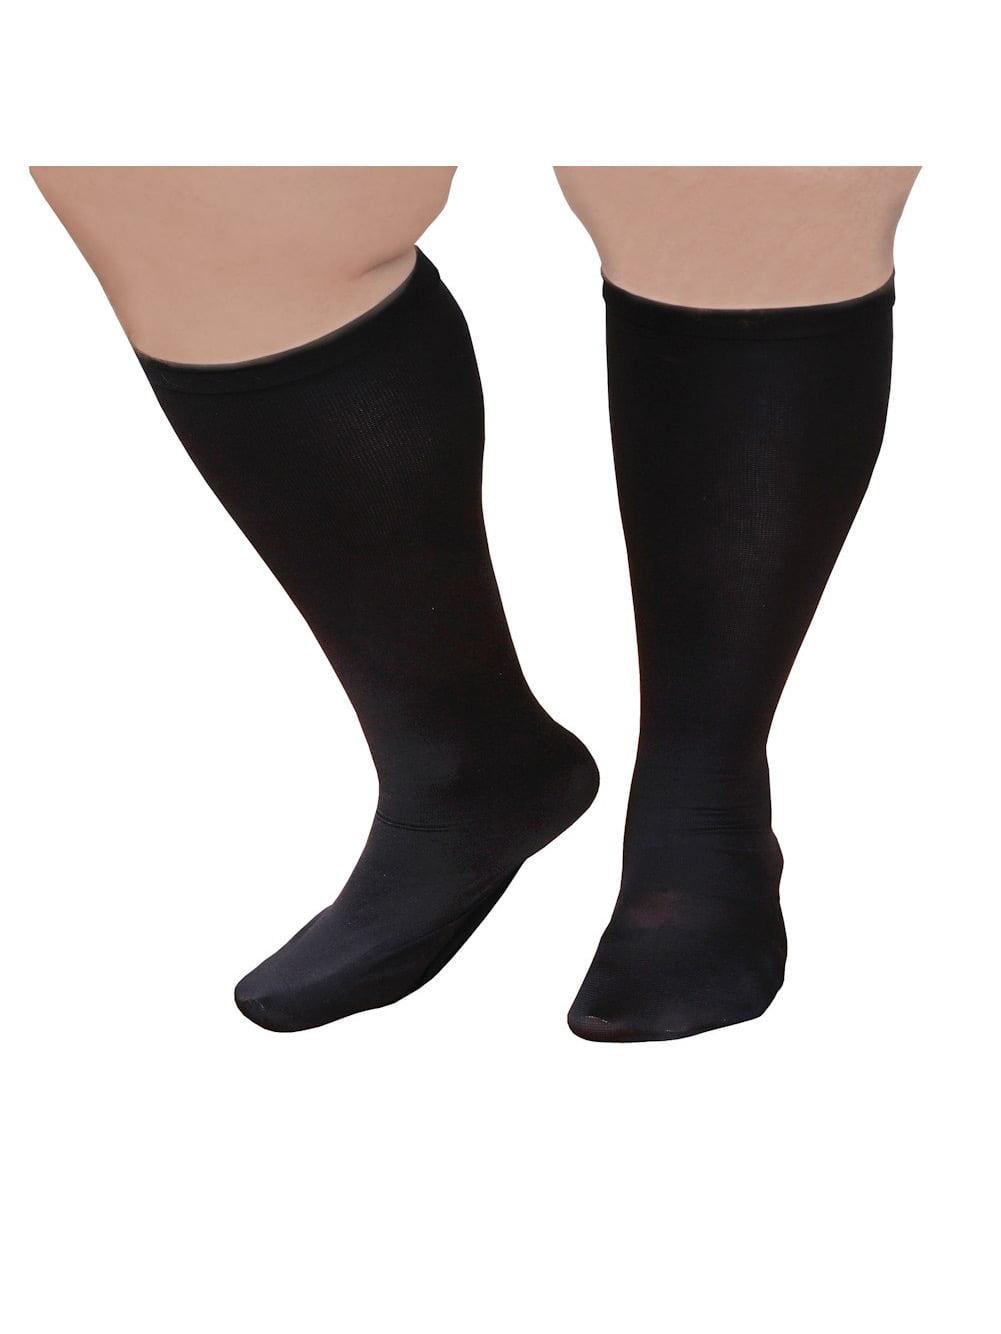 Unisex Extra Wide Moderate Compression Knee High Socks Up To Xw 4e Amp 26 Quot Calf Walmart Com